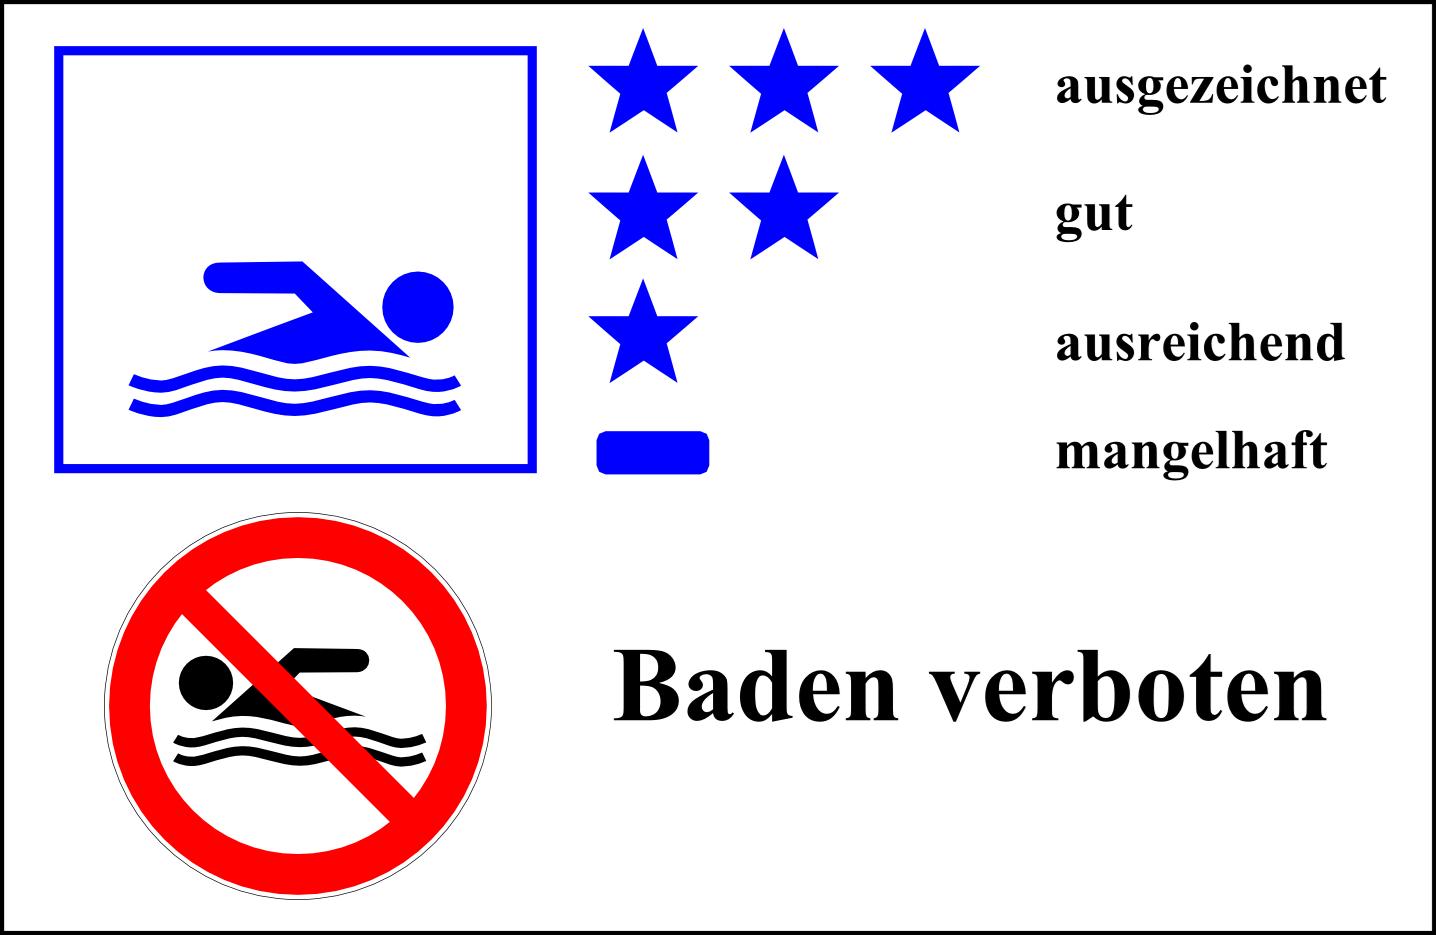 Weiher stauffendorfer Stauffendorfer Weiher: